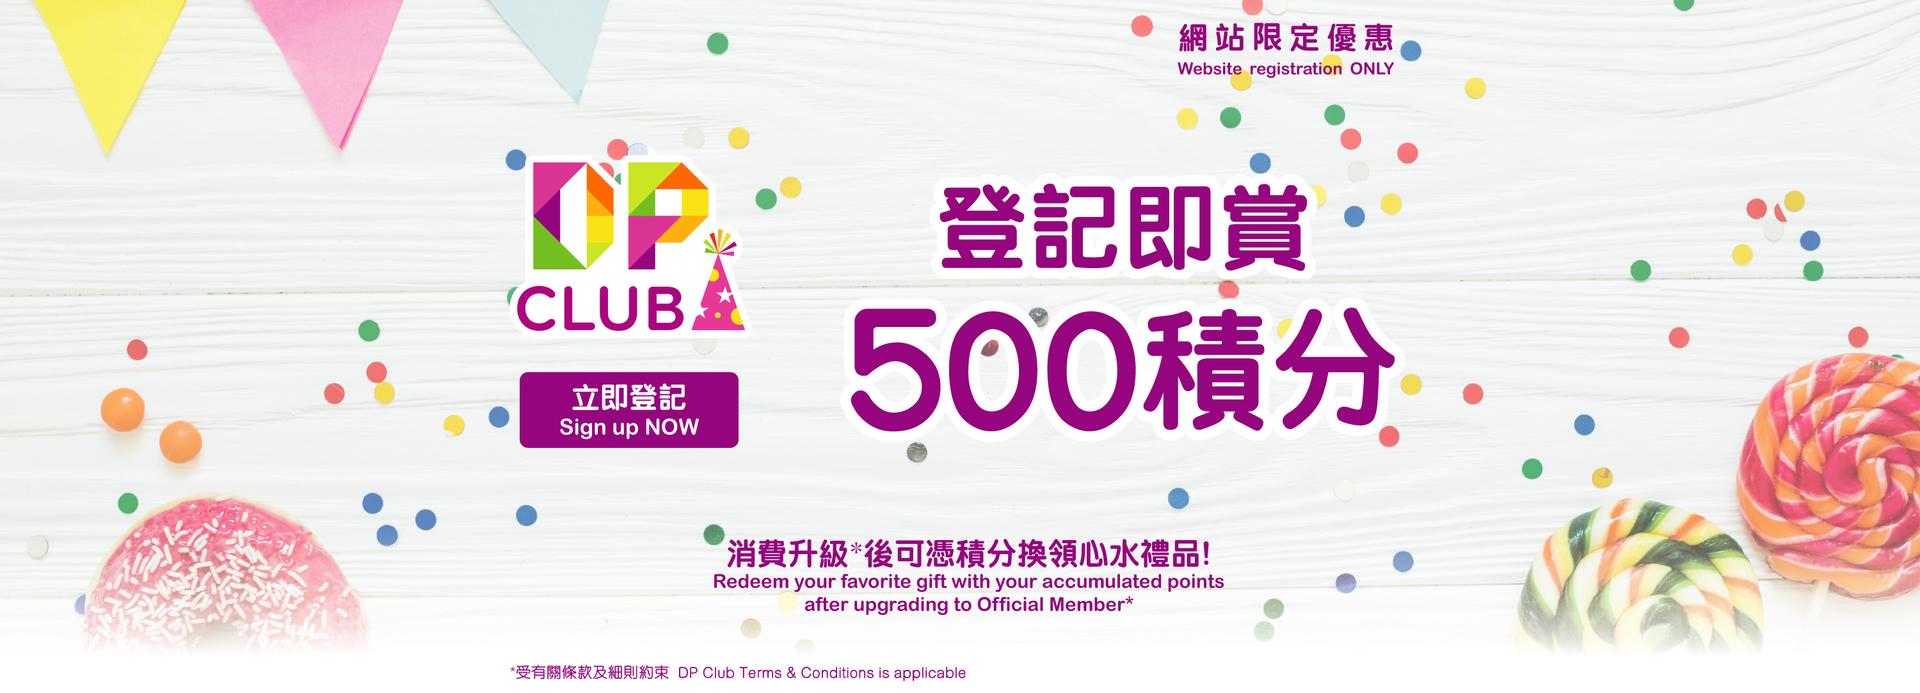 Dpclub 500 banner 3000x1083px large